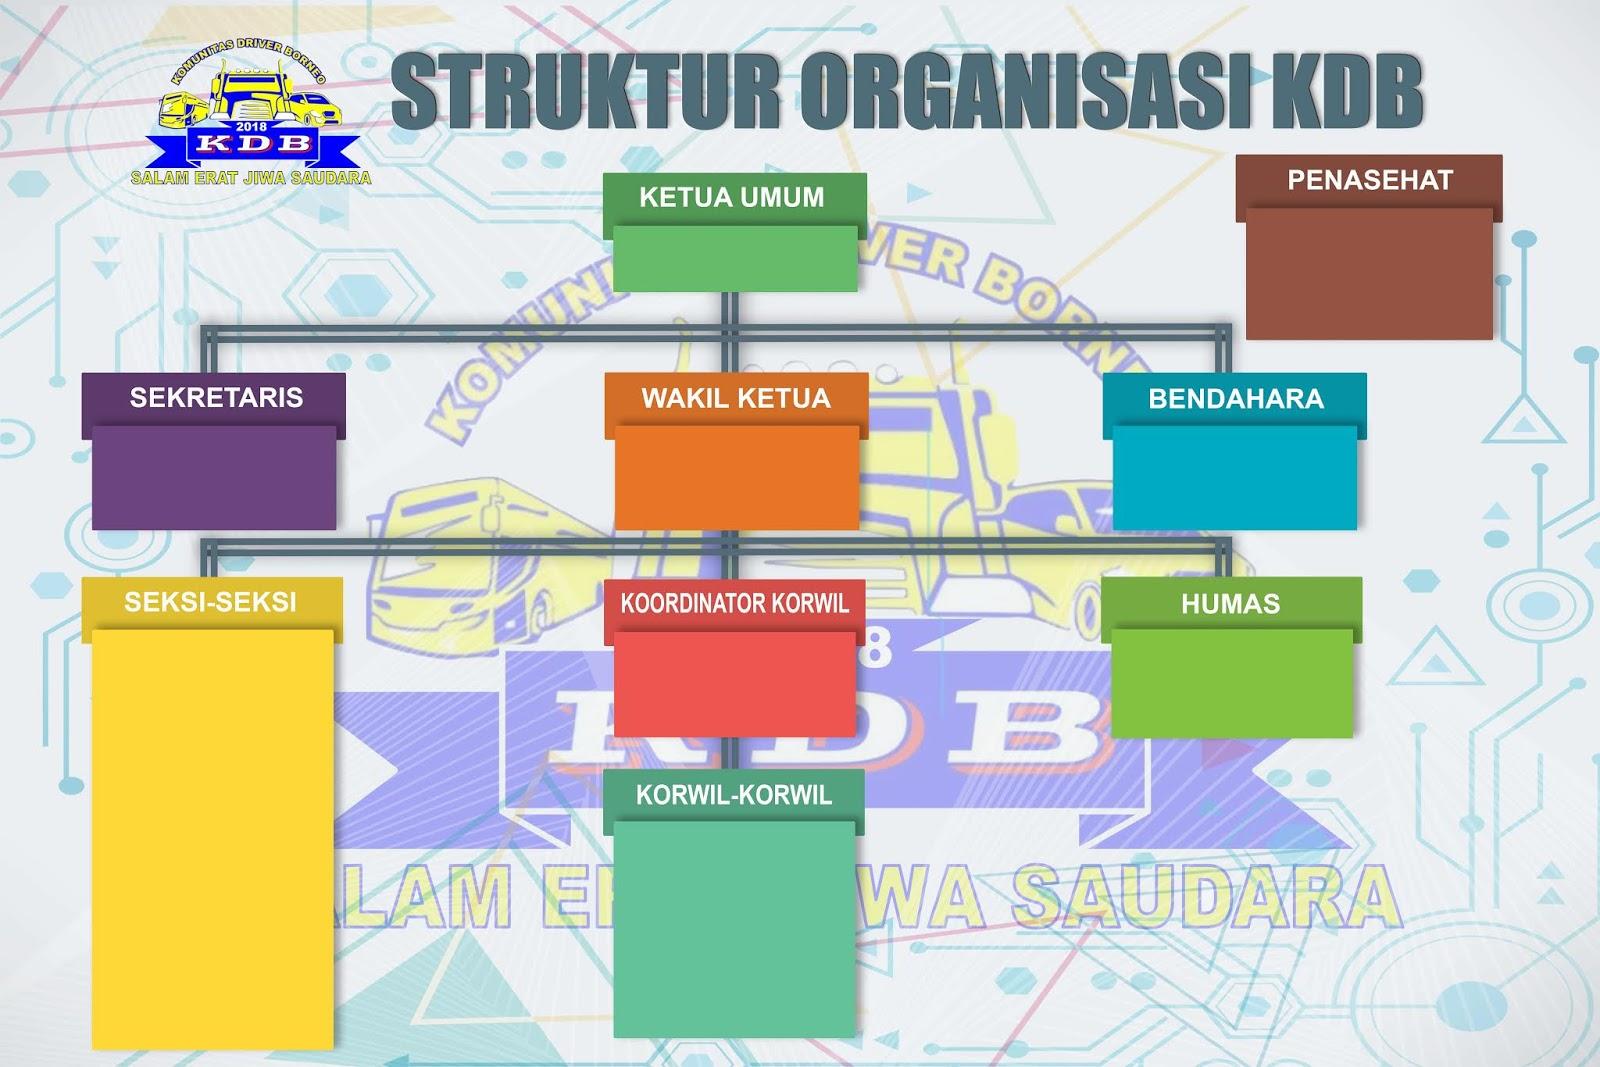 Desain Struktur Organisasi Keren PSD - Riza Corel